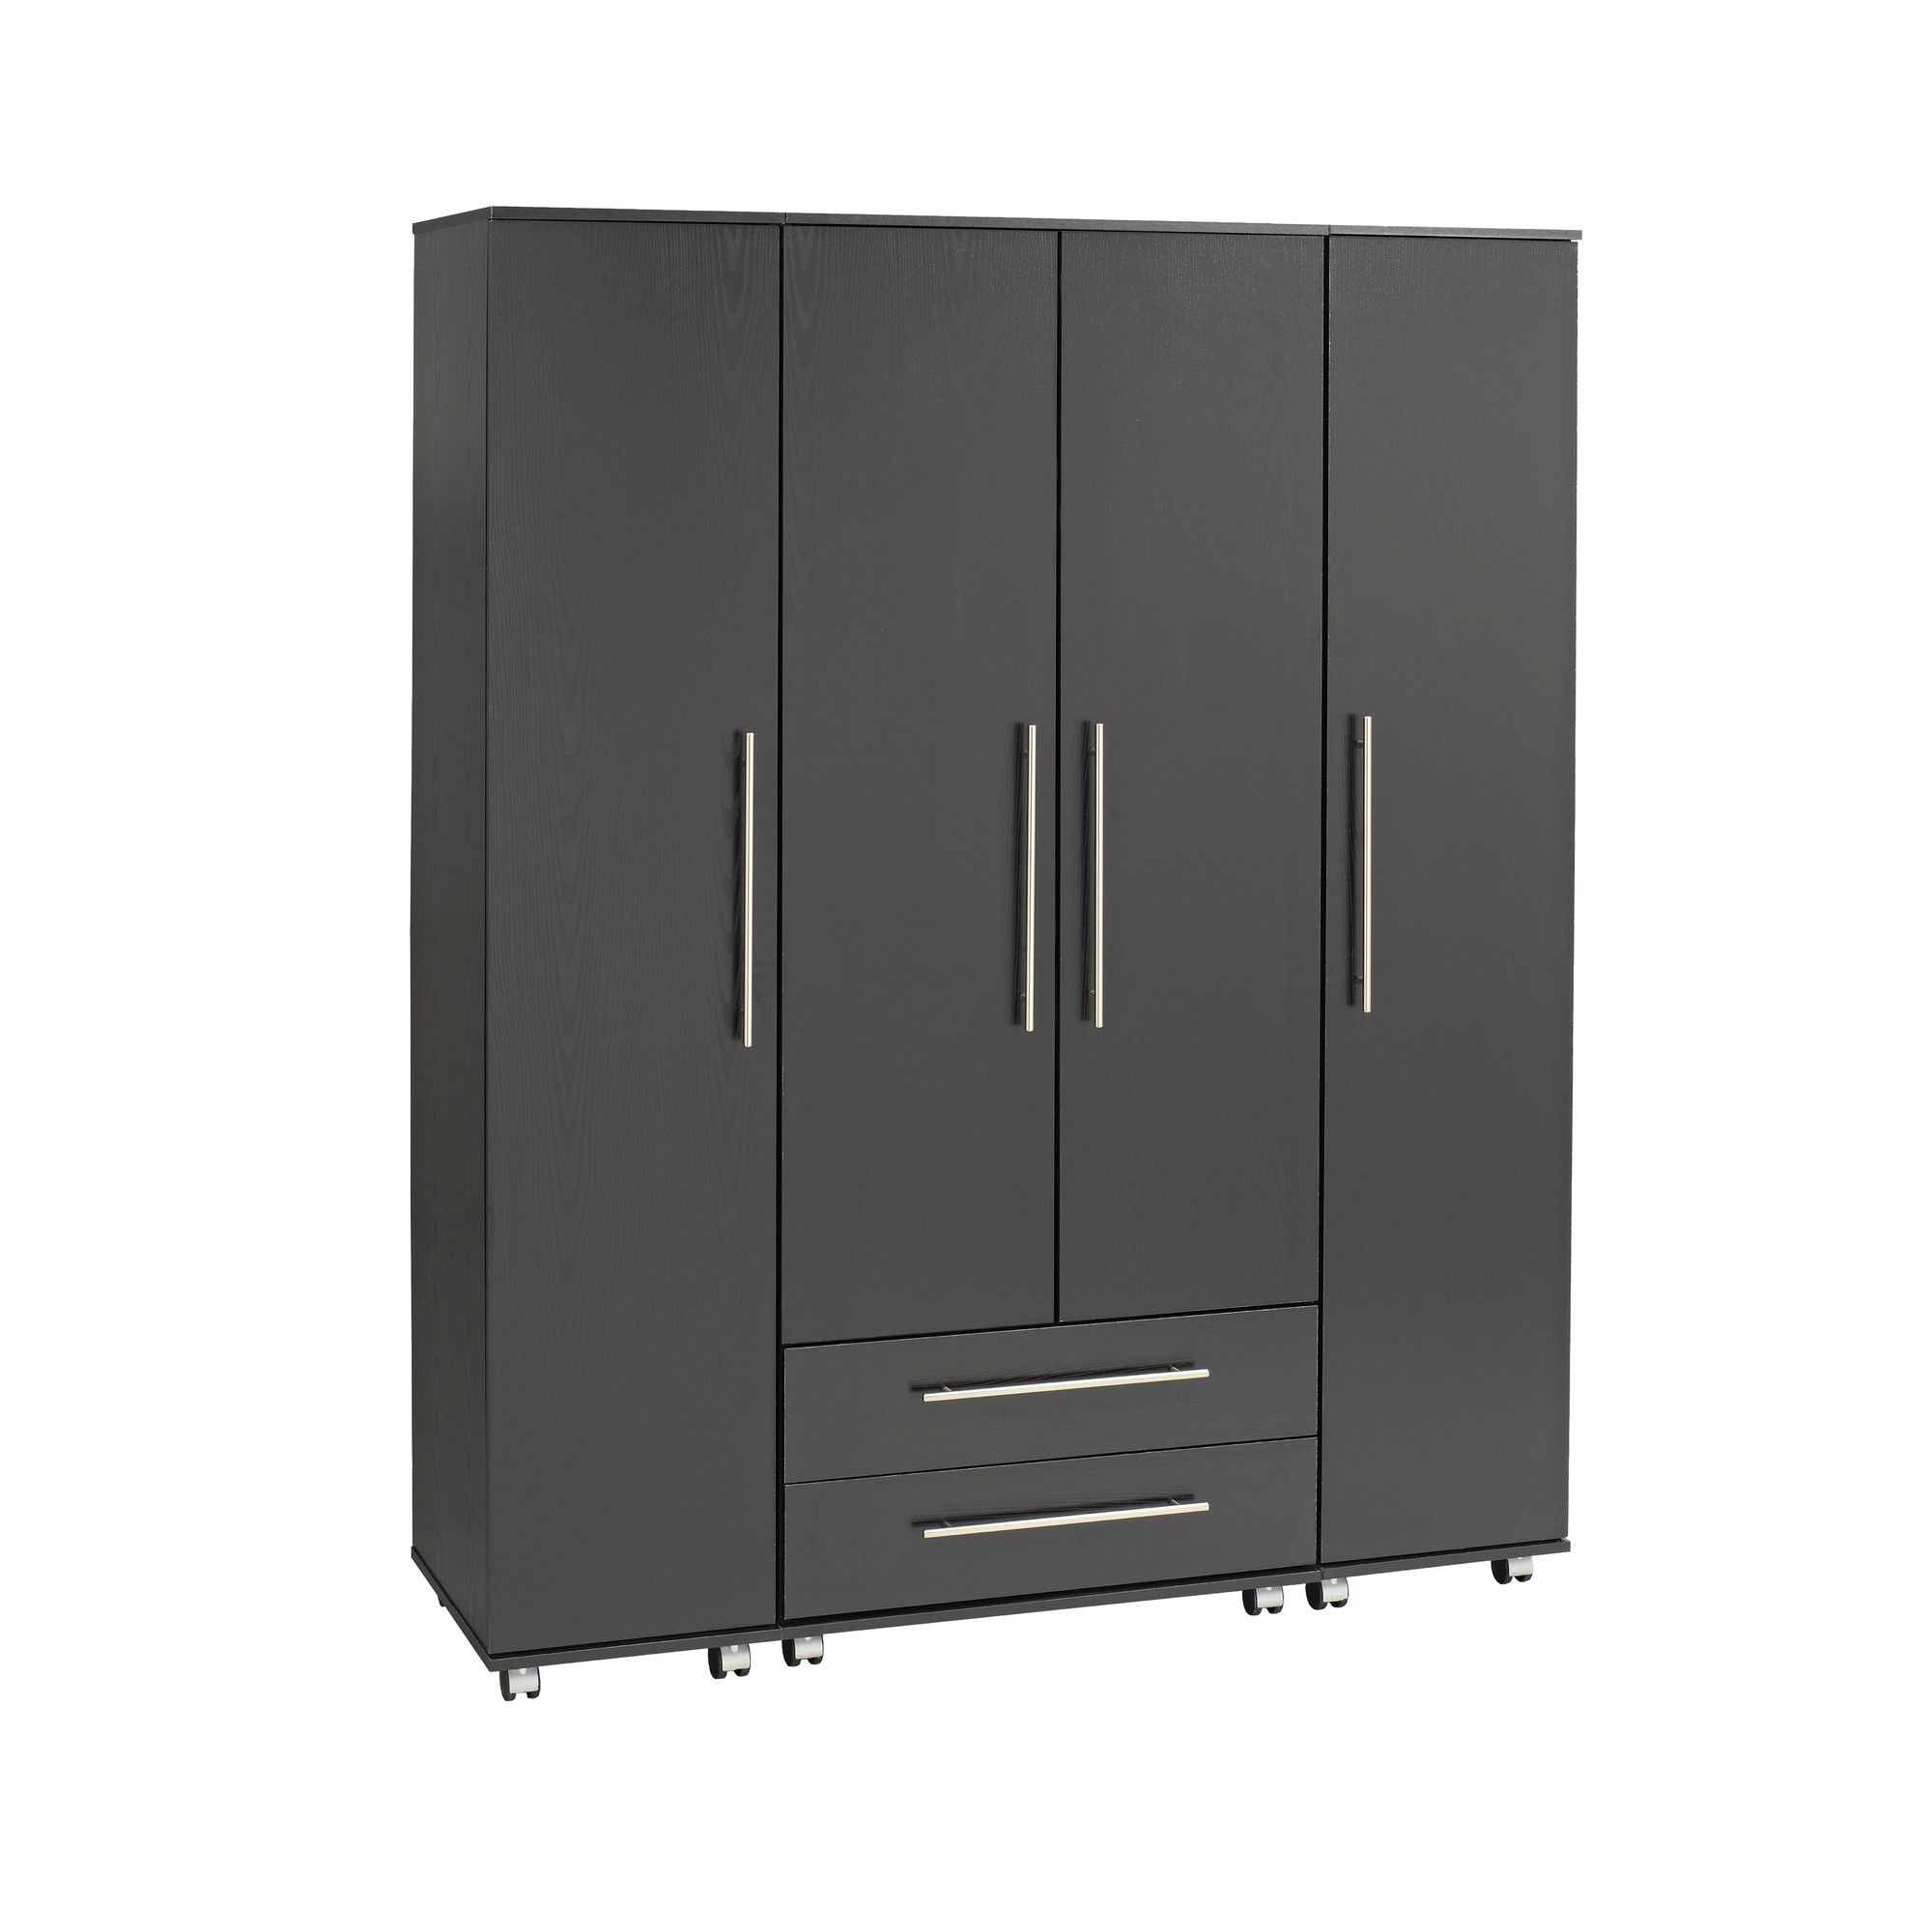 Ideal Furniture Bobby 4 Door Wardrobe - Oak at Tesco Direct